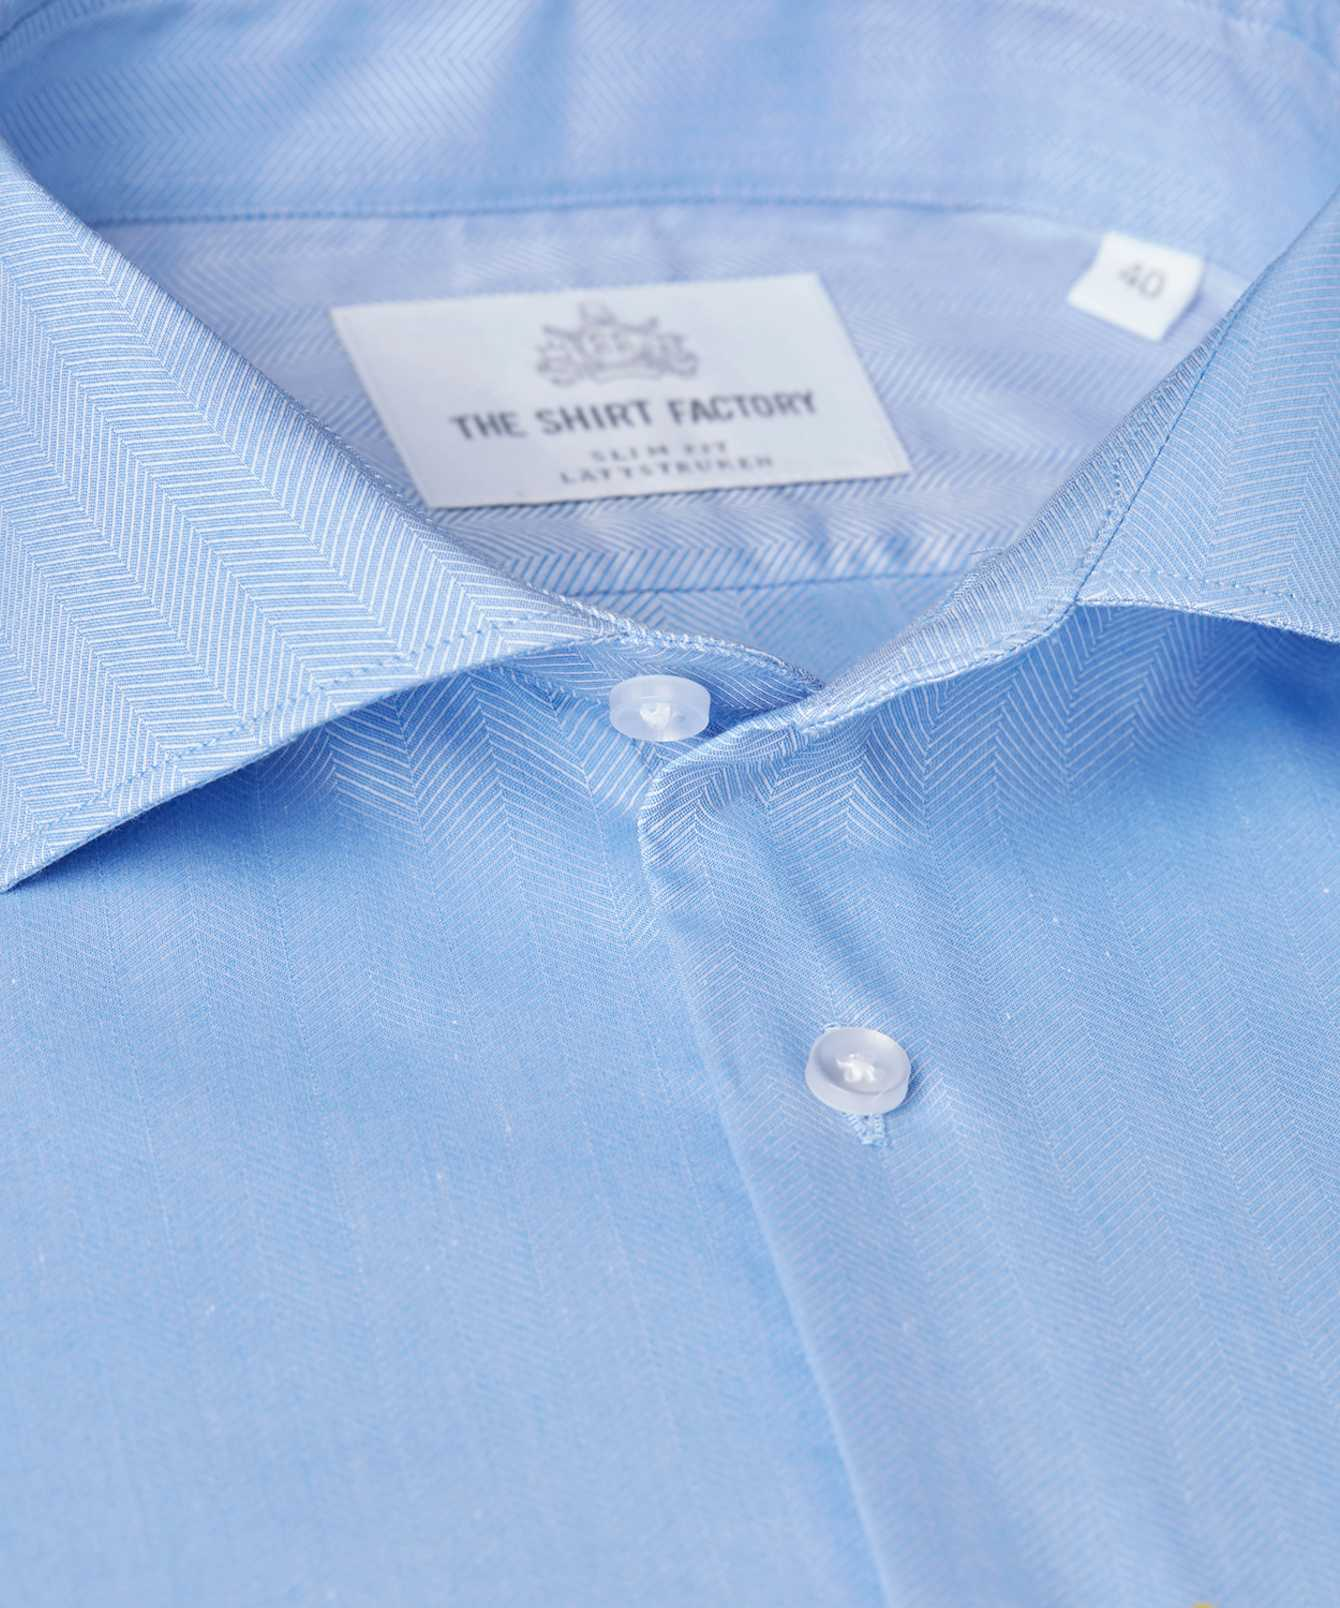 Skjorta Durness The Shirt Factory